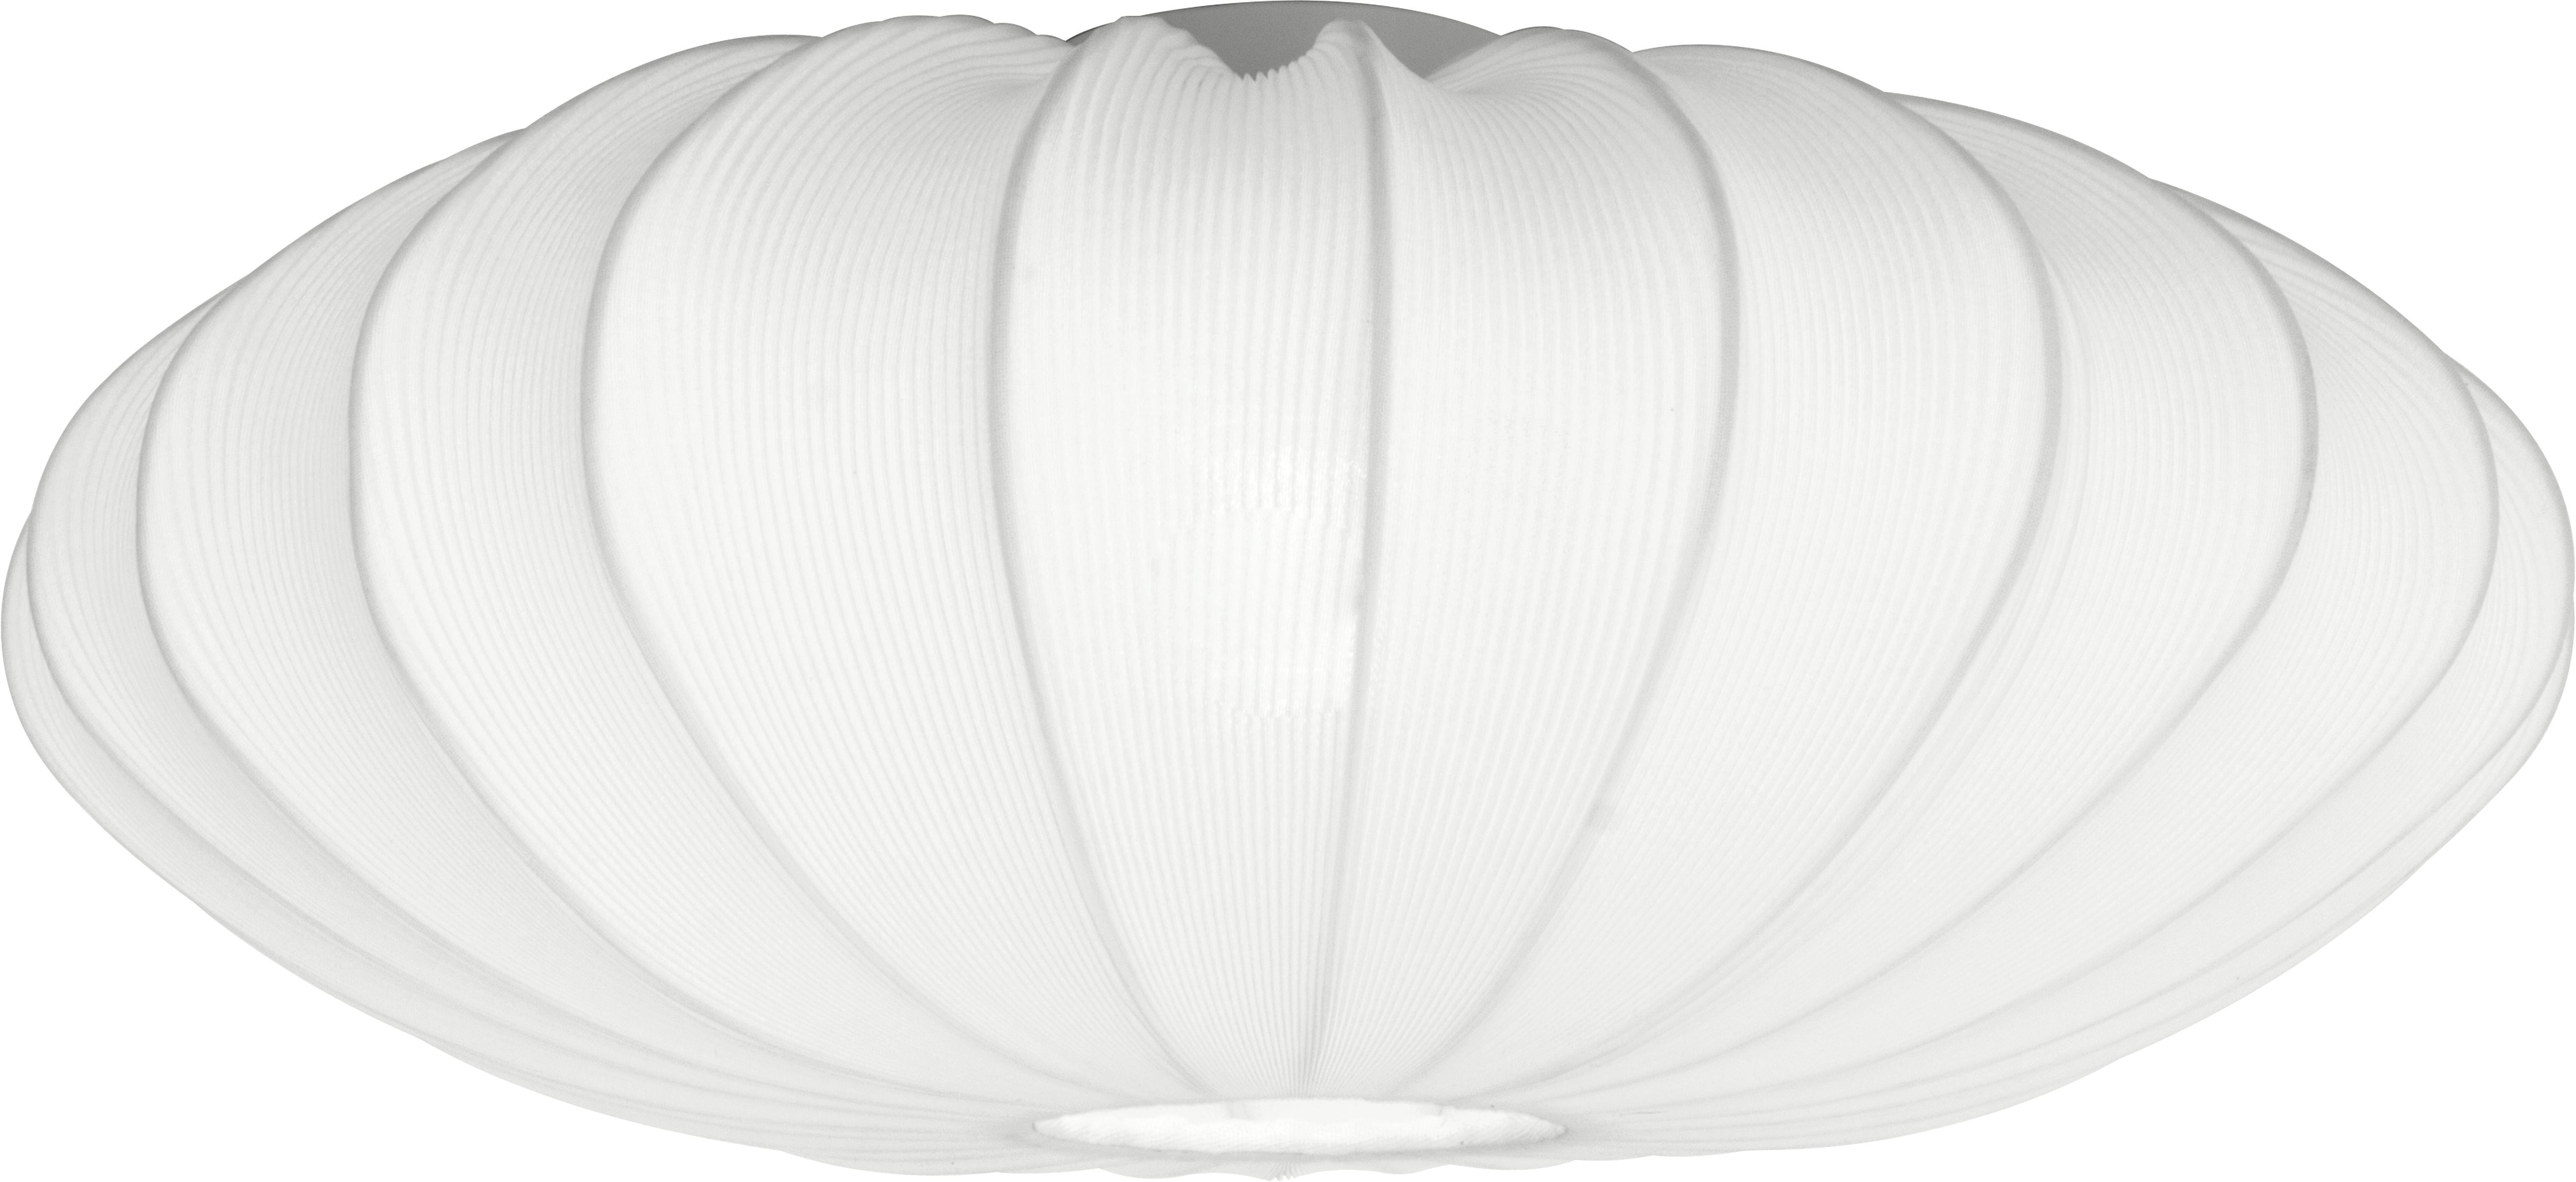 Plafondlamp Mamsell, Metaal, textiel, Wit, Ø 65 x H 27 cm